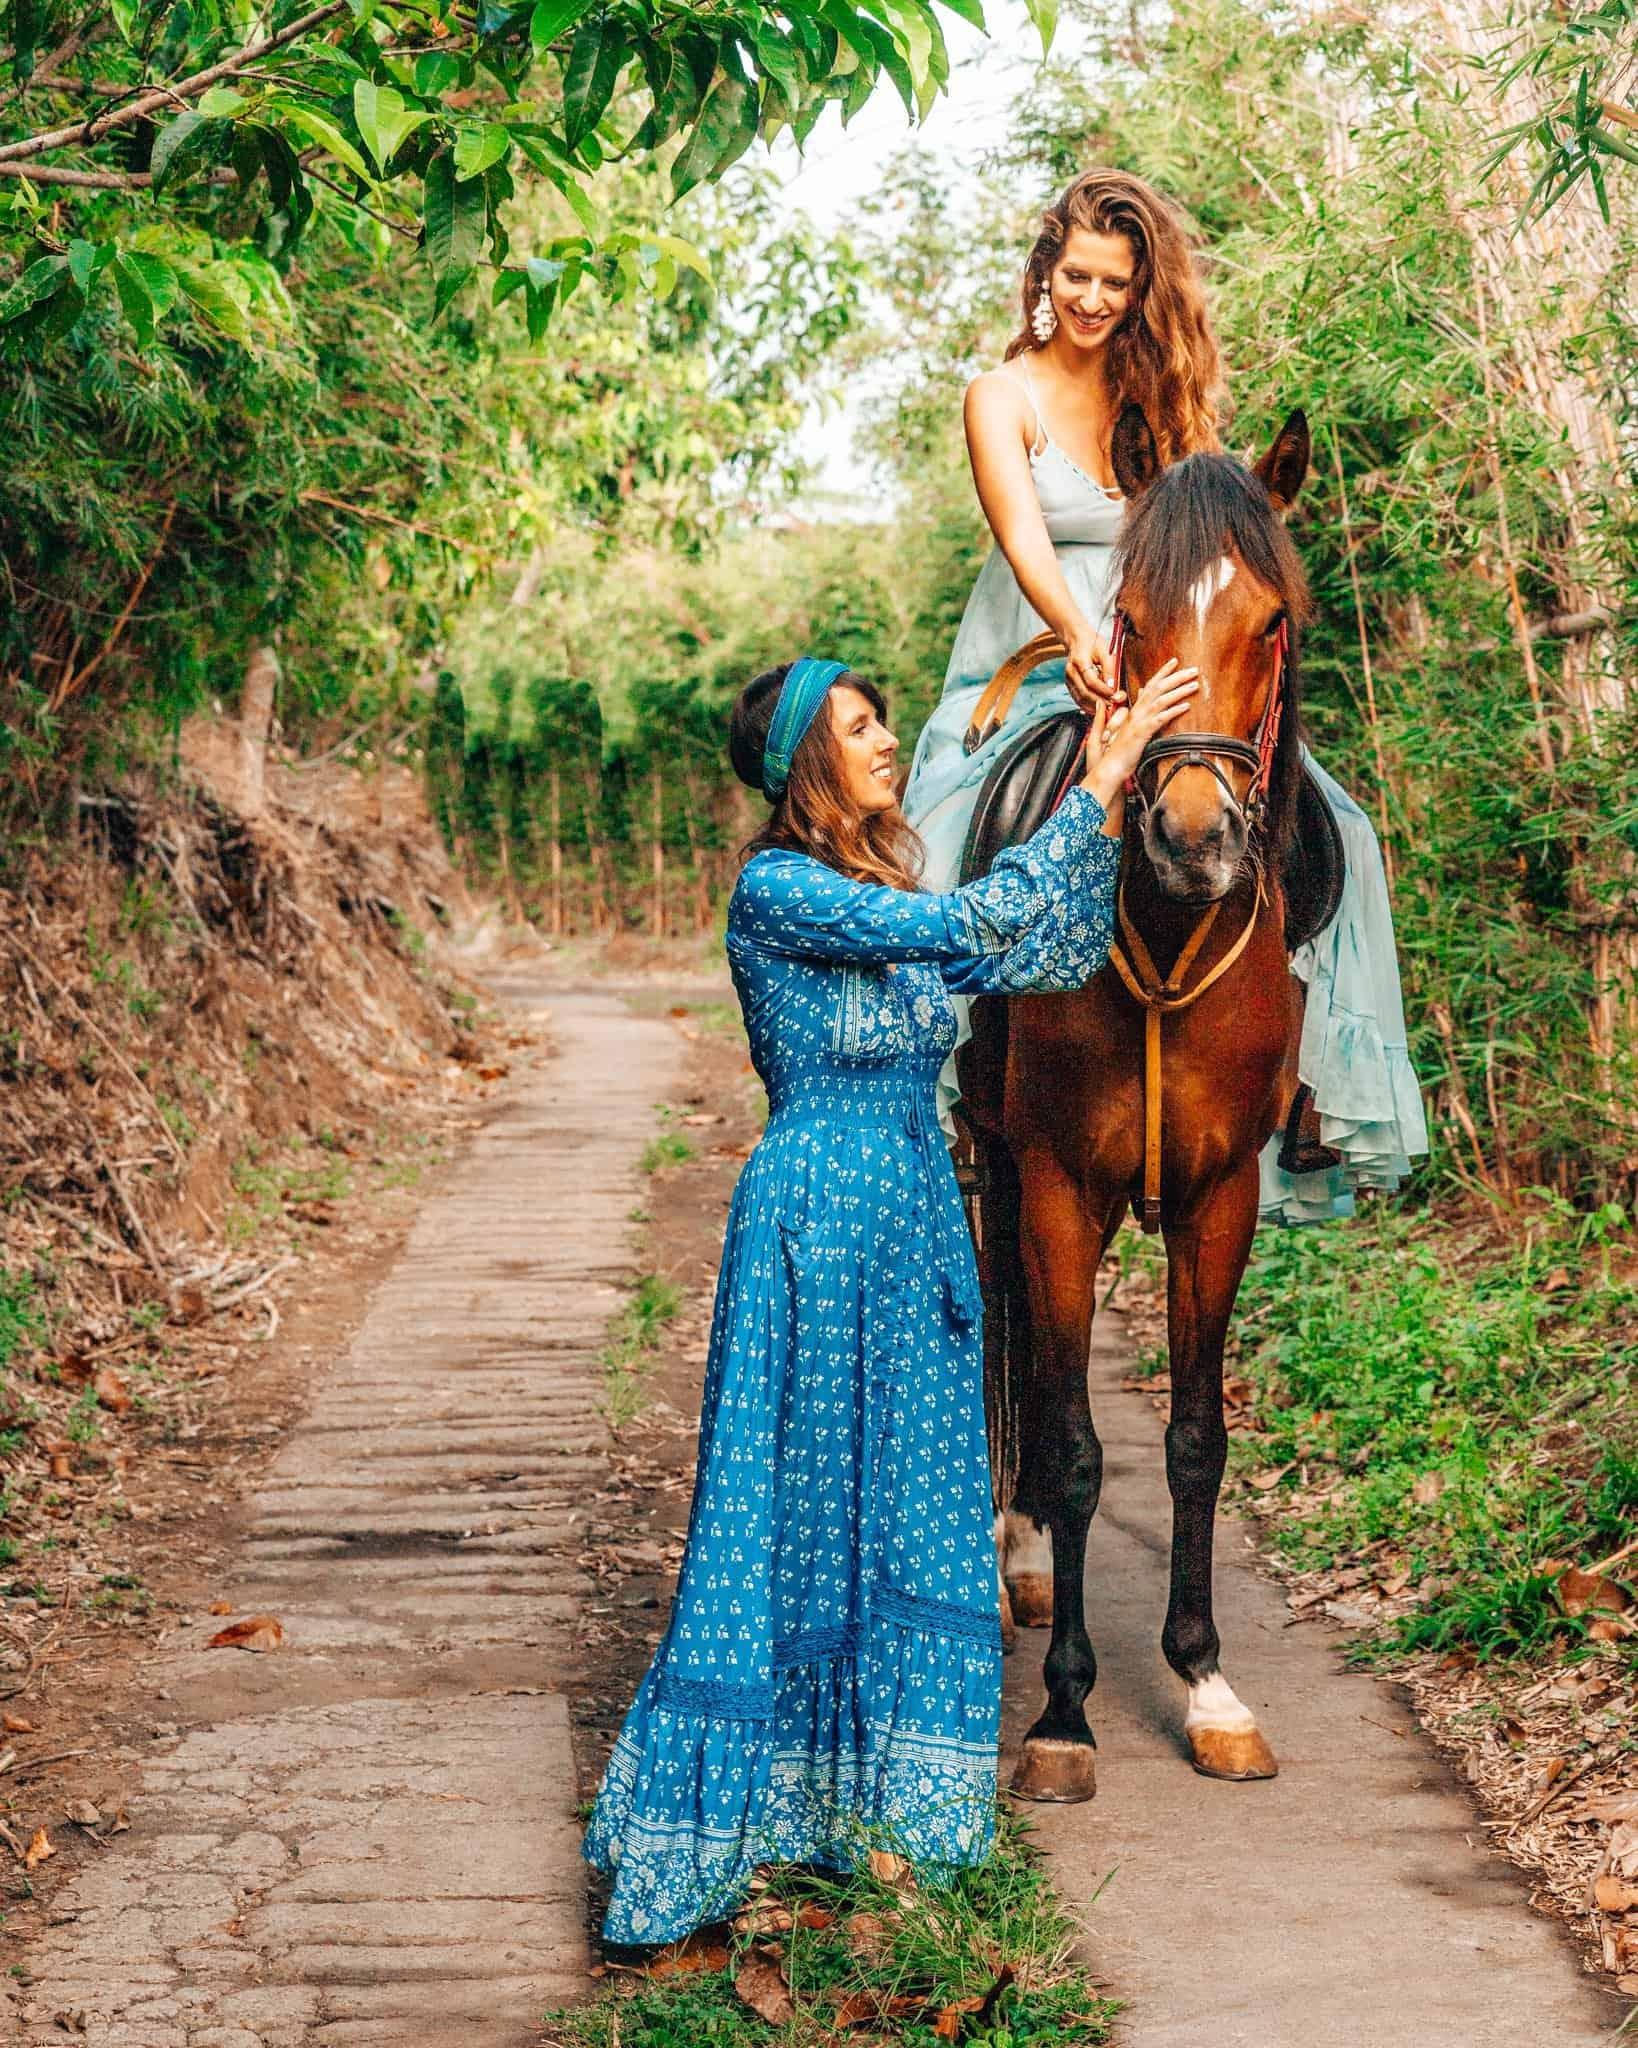 Horse Back Riding at Munduk Moding Plantation Bali - The Next Trip